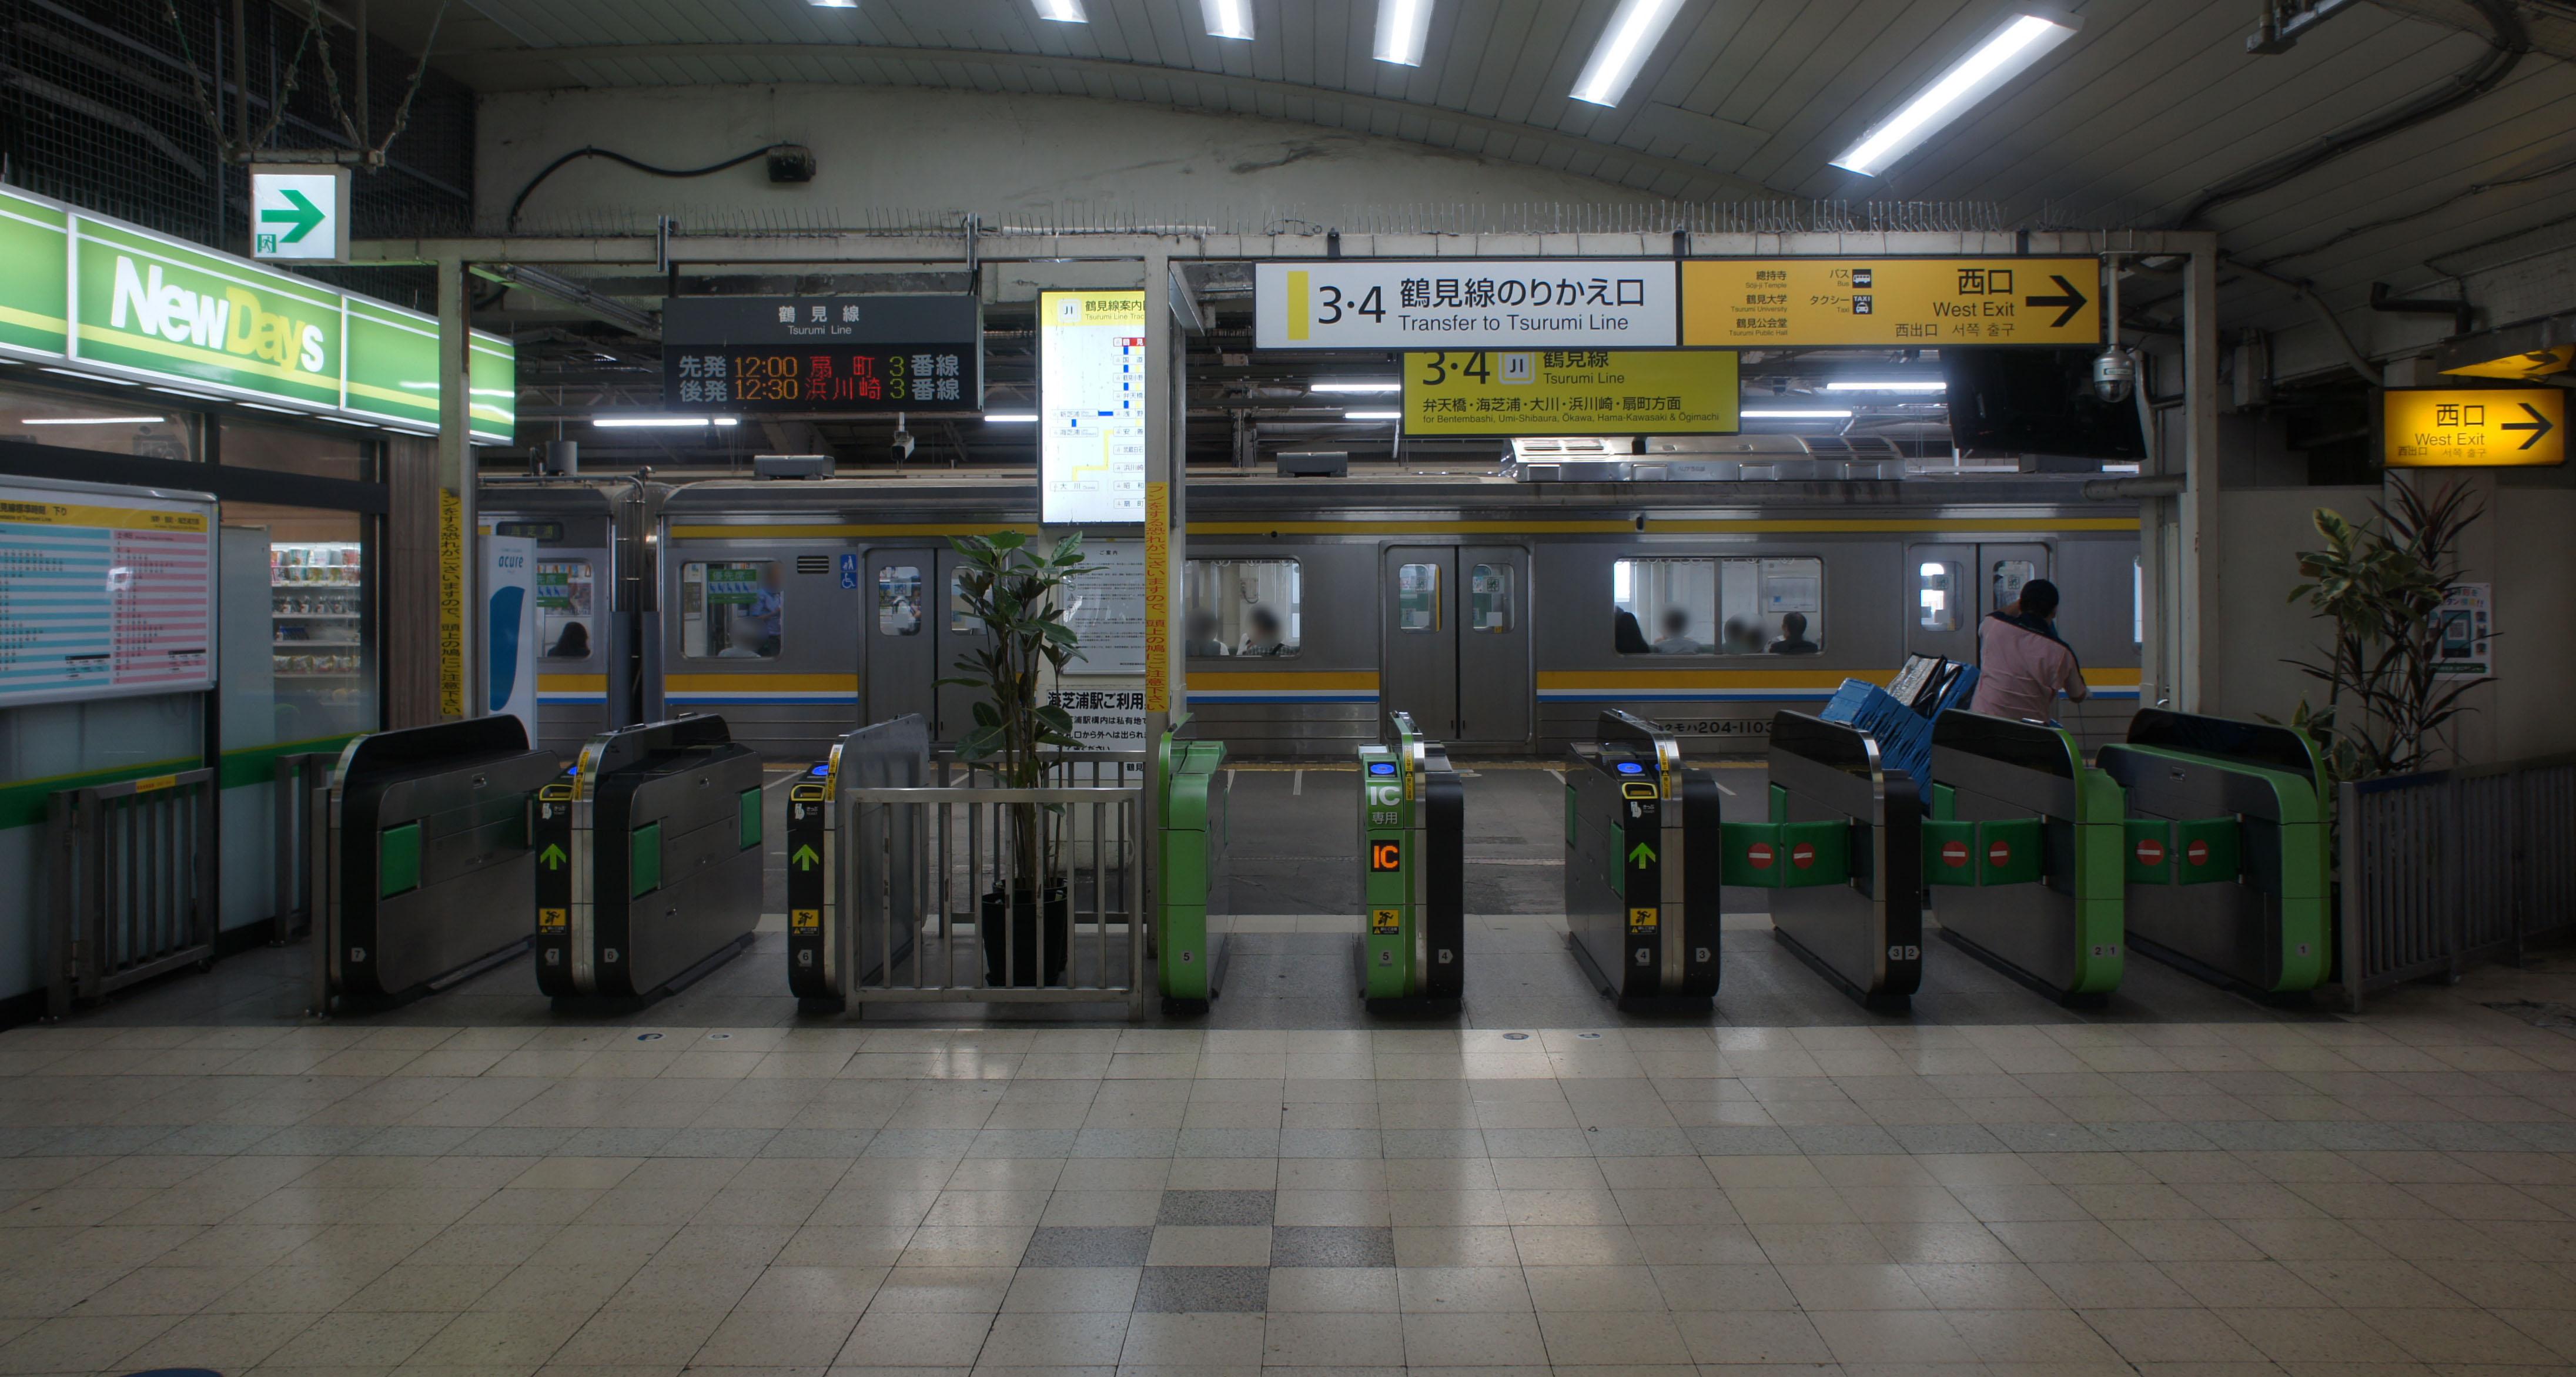 https://upload.wikimedia.org/wikipedia/commons/f/fb/JR_Tsurumi_Station_Tsurumi_Line_Transfer_Gates.jpg